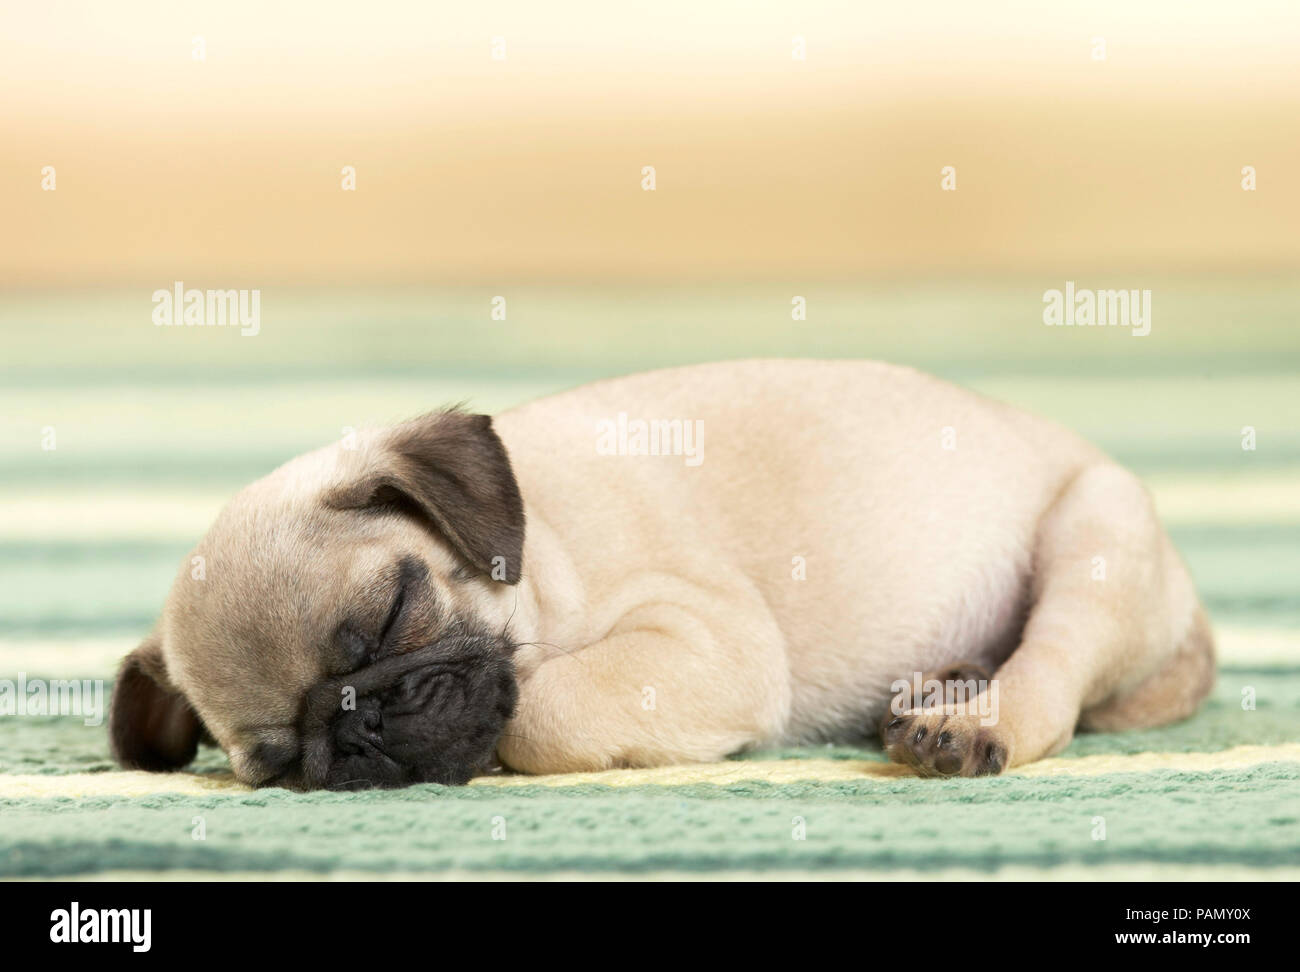 Pug. Puppy sleeping on a rug. Germany - Stock Image